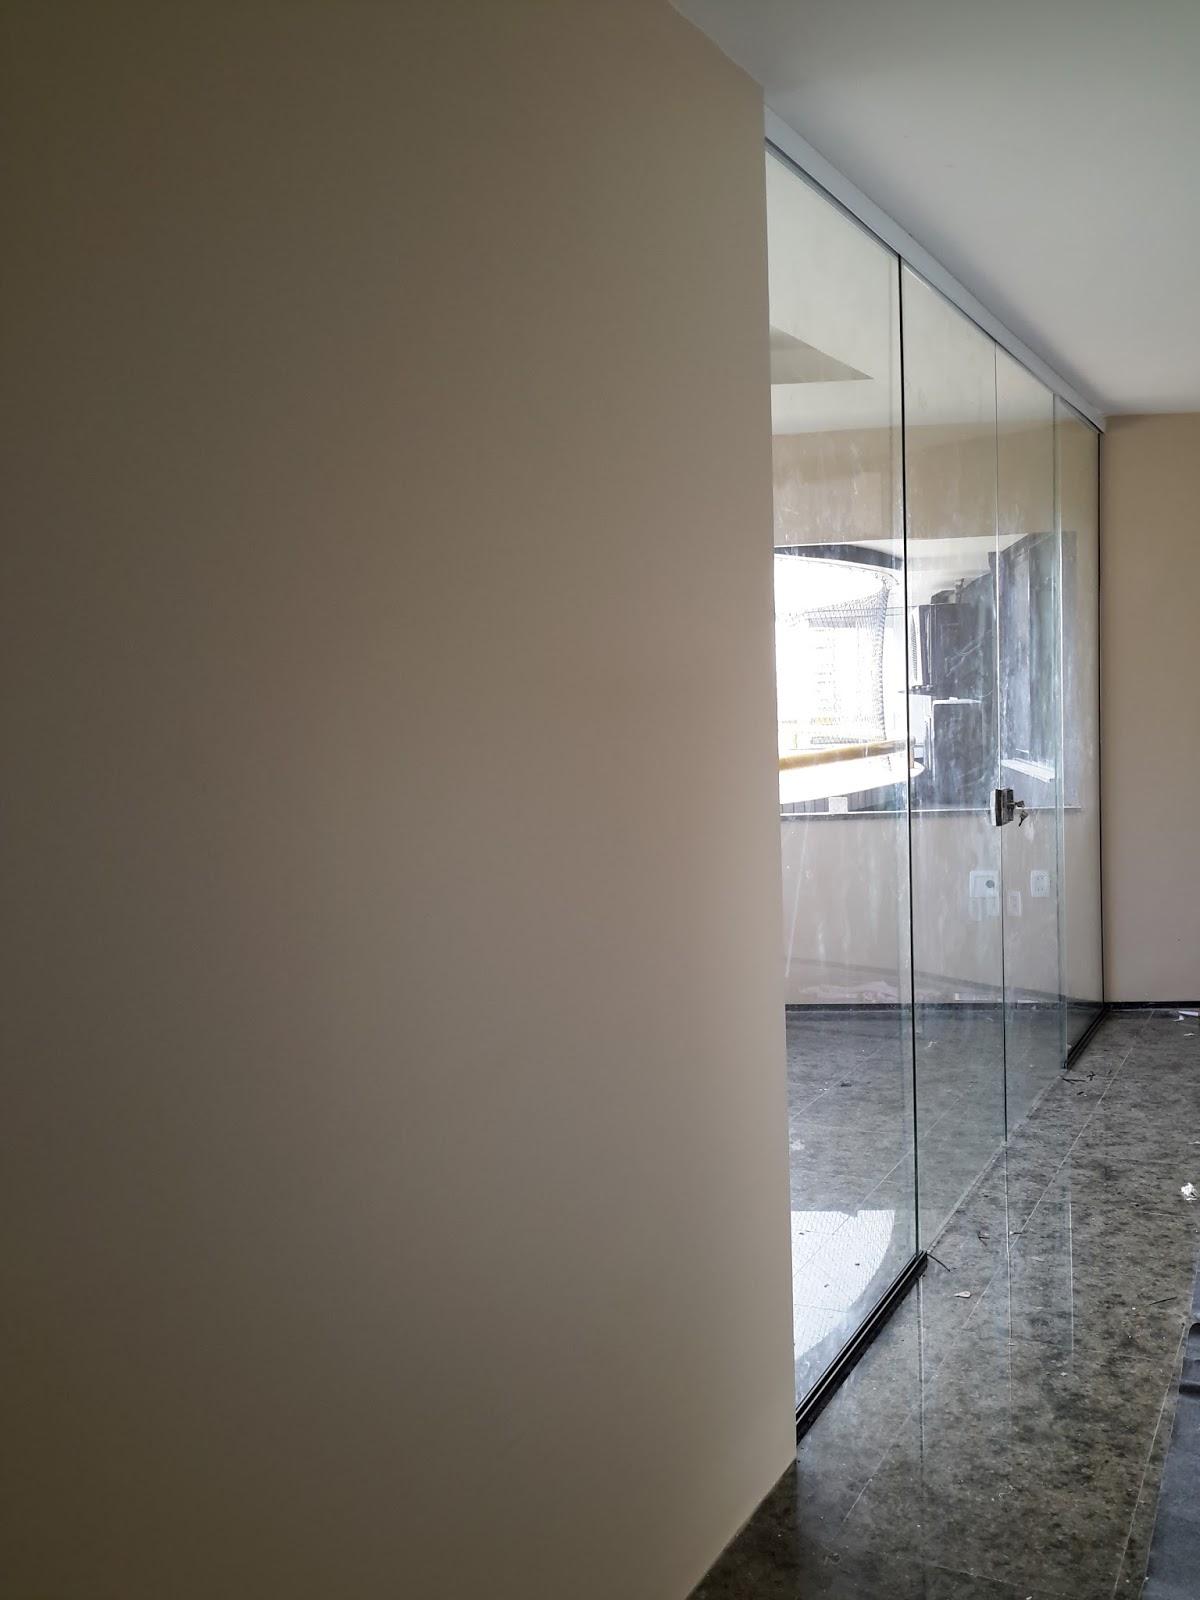 #4B4337  VIDRAÇARIA : JANELA E PORTA M 2000 DE VIDRO TEMPERADO EM FORTALEZA 414 Janelas De Vidros Em Fortaleza